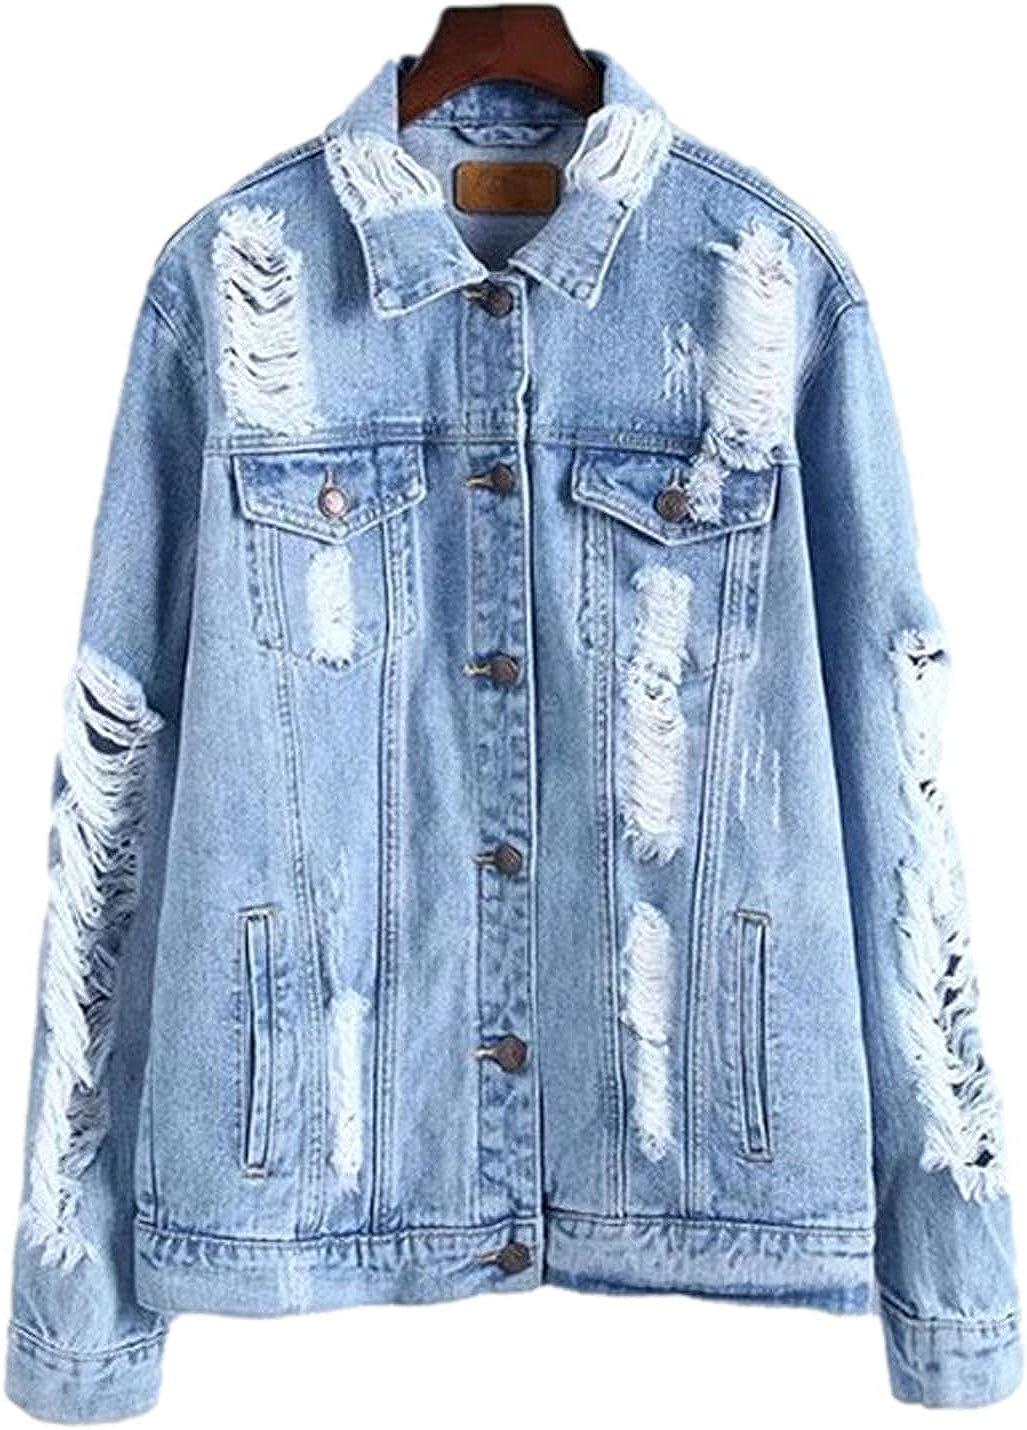 Peaceglad Women's Ripped Denim Single Breasted Coat Jacket Baseball Uniform